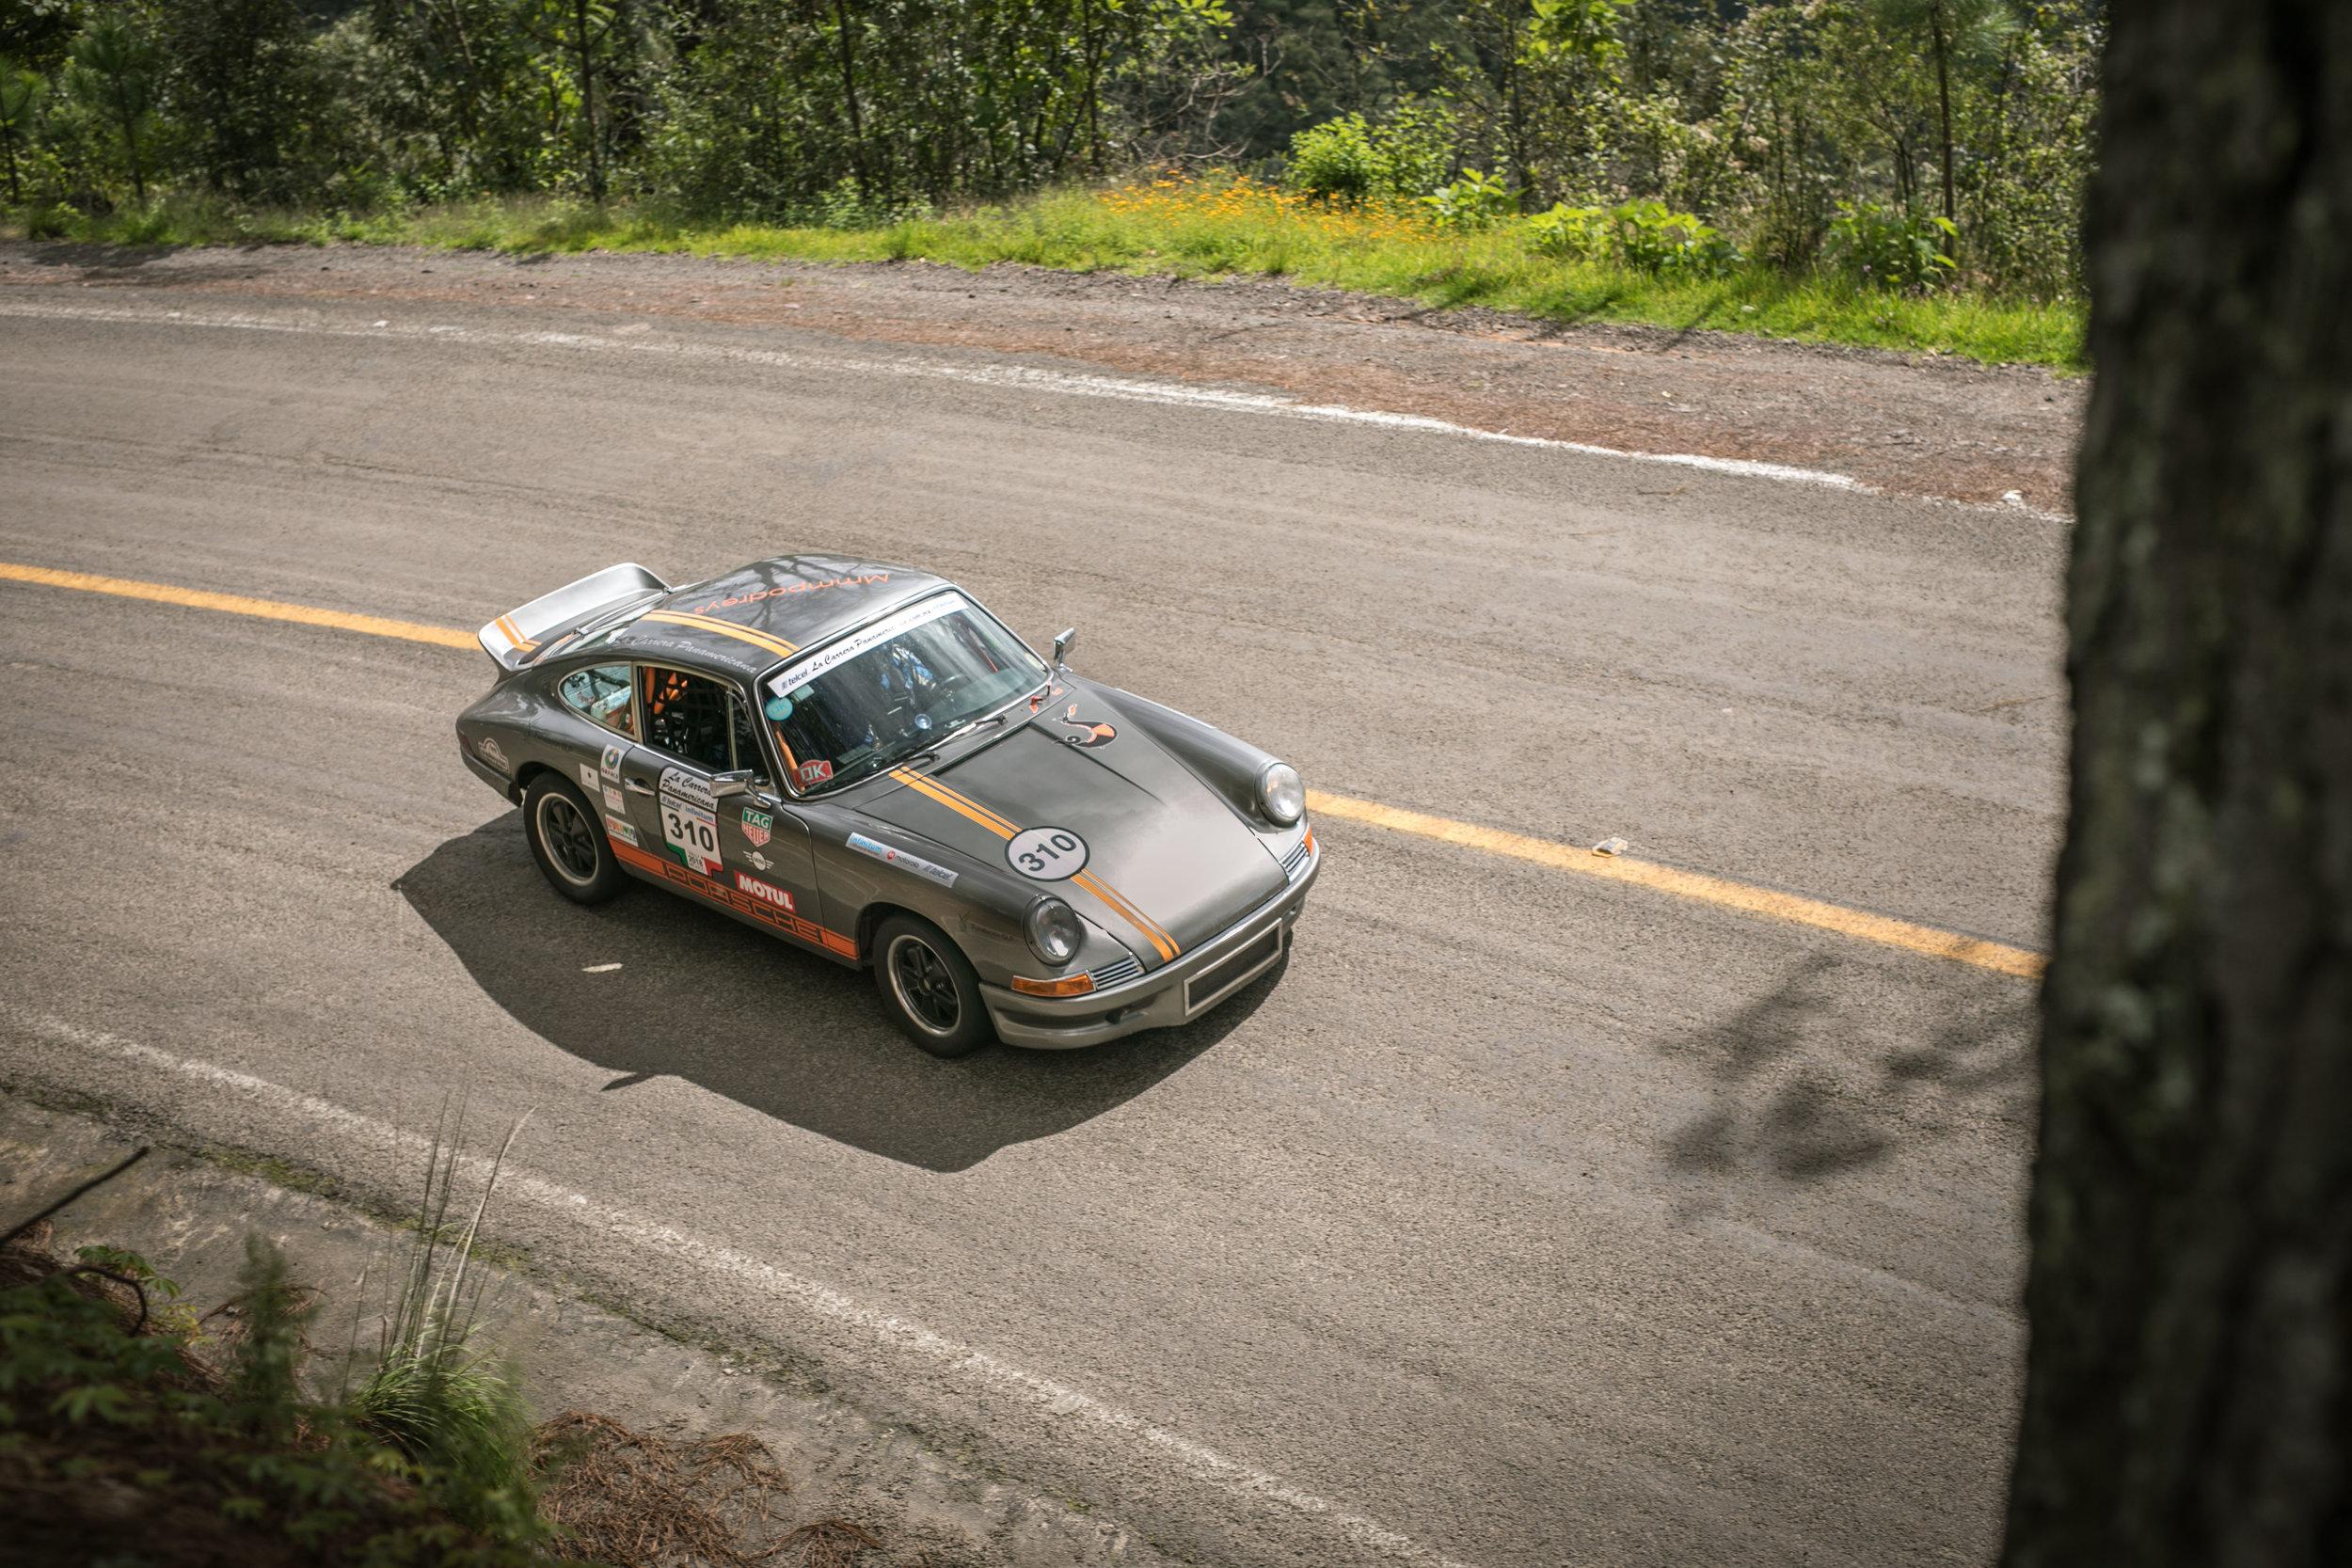 Carrera Panamericana_1 (1 of 2).jpg